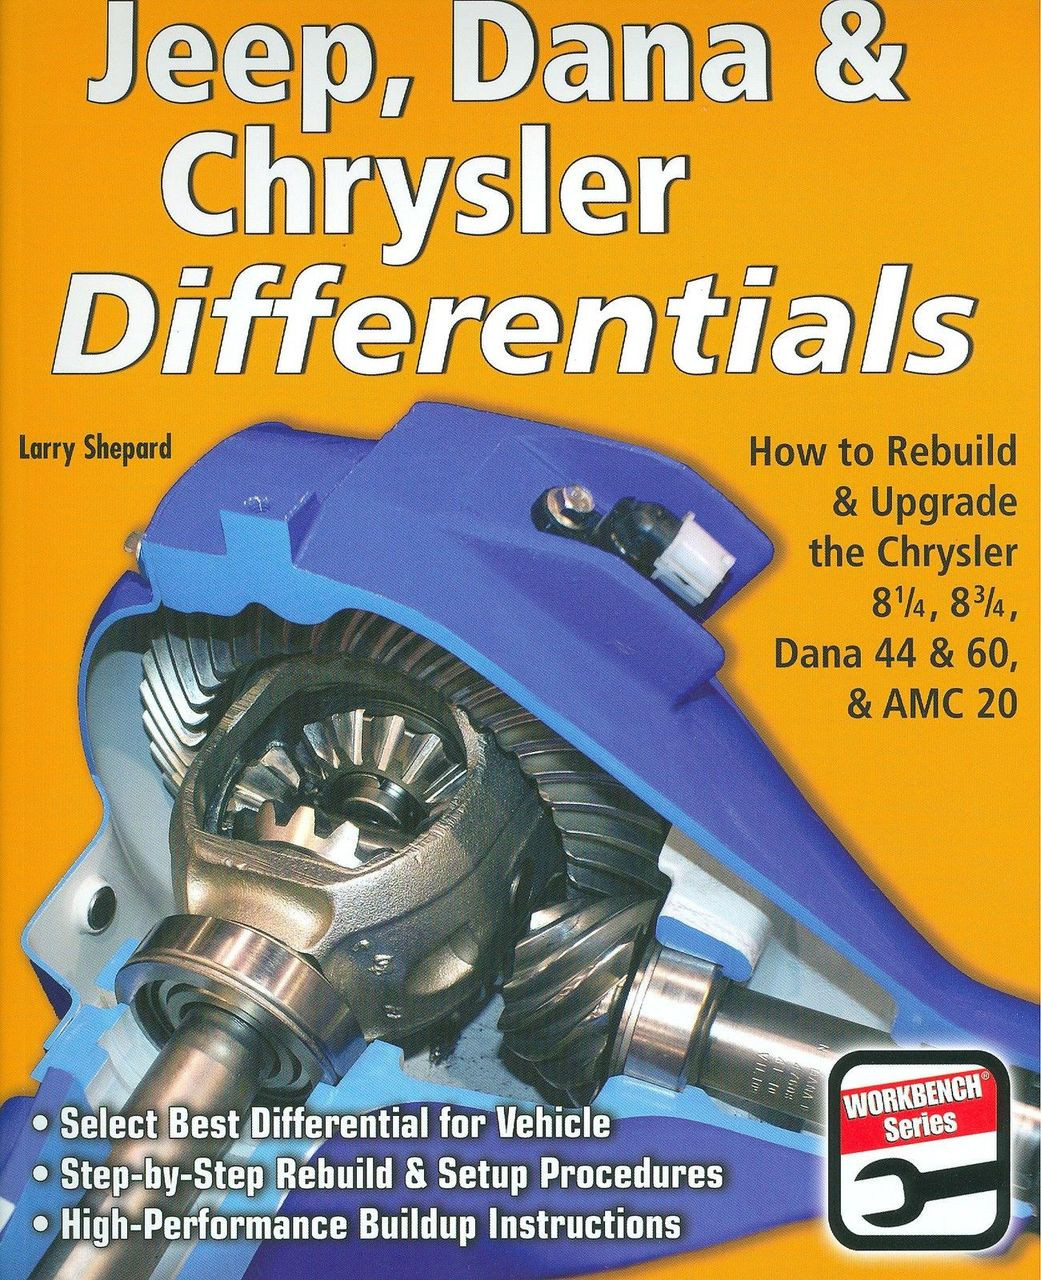 DANA & CHRYSLER DIFFERENTIALS-REBUILD & MODIFY-CHRY 8 1/4, 8